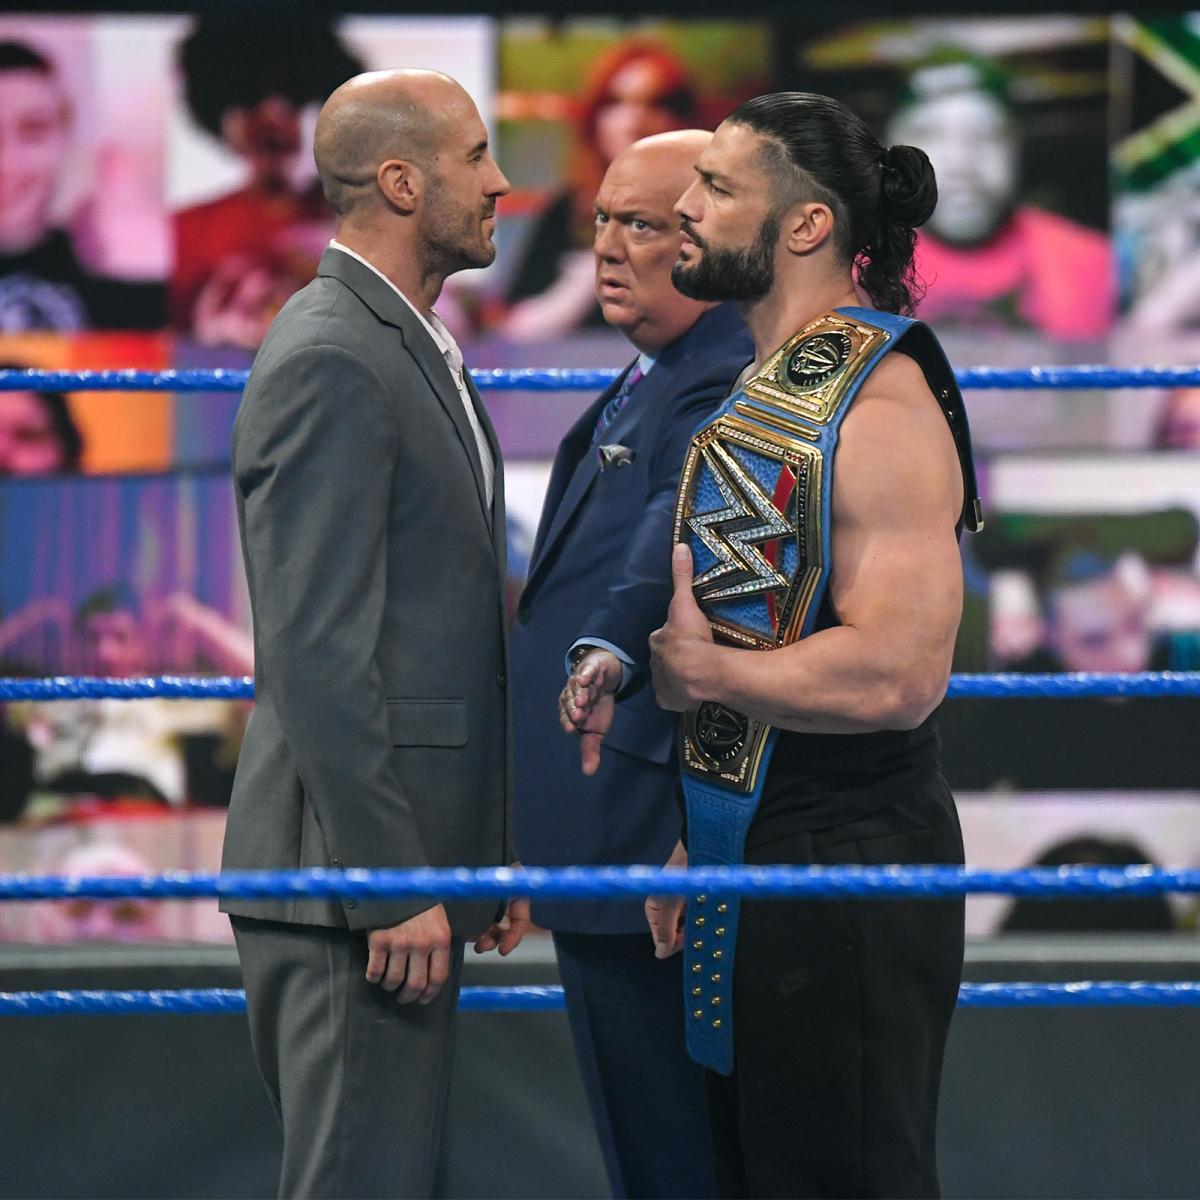 WWEユニバーサル王者ローマン・レインズ(右端)に挑戦要求したセザーロ(左端)。中央はポール・ヘイマン(C)2021 WWE, Inc. All Rights Reserved.